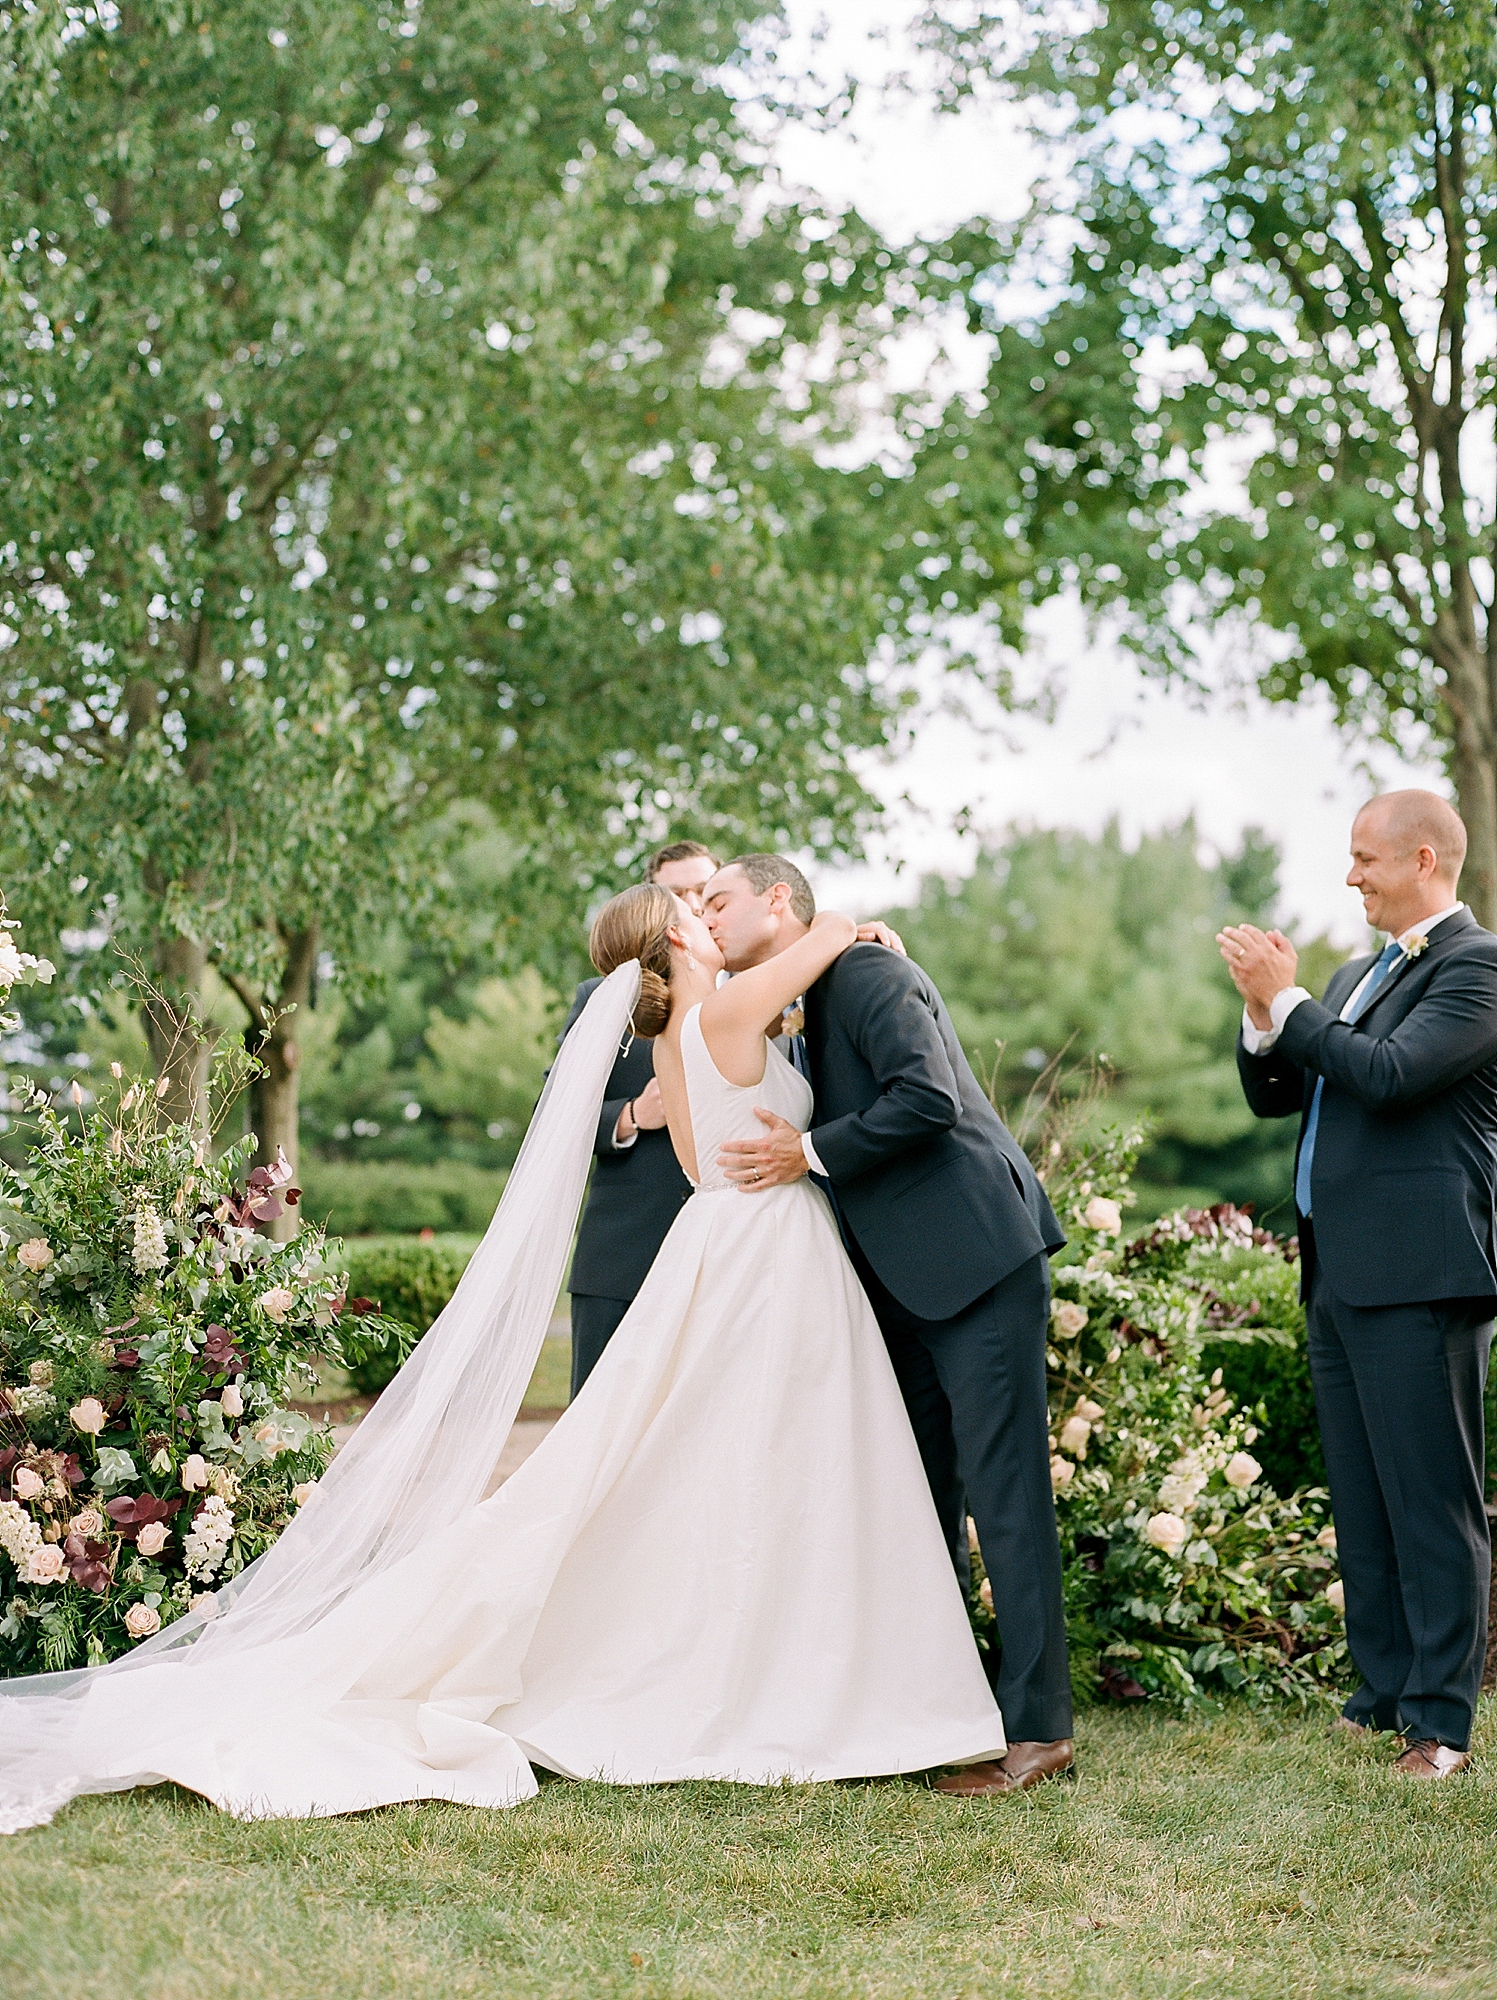 Princeton New Jersey Film Wedding Photographer Princeton University Wedding Photography by Magdalena Studios NJ Wedding Photographer38